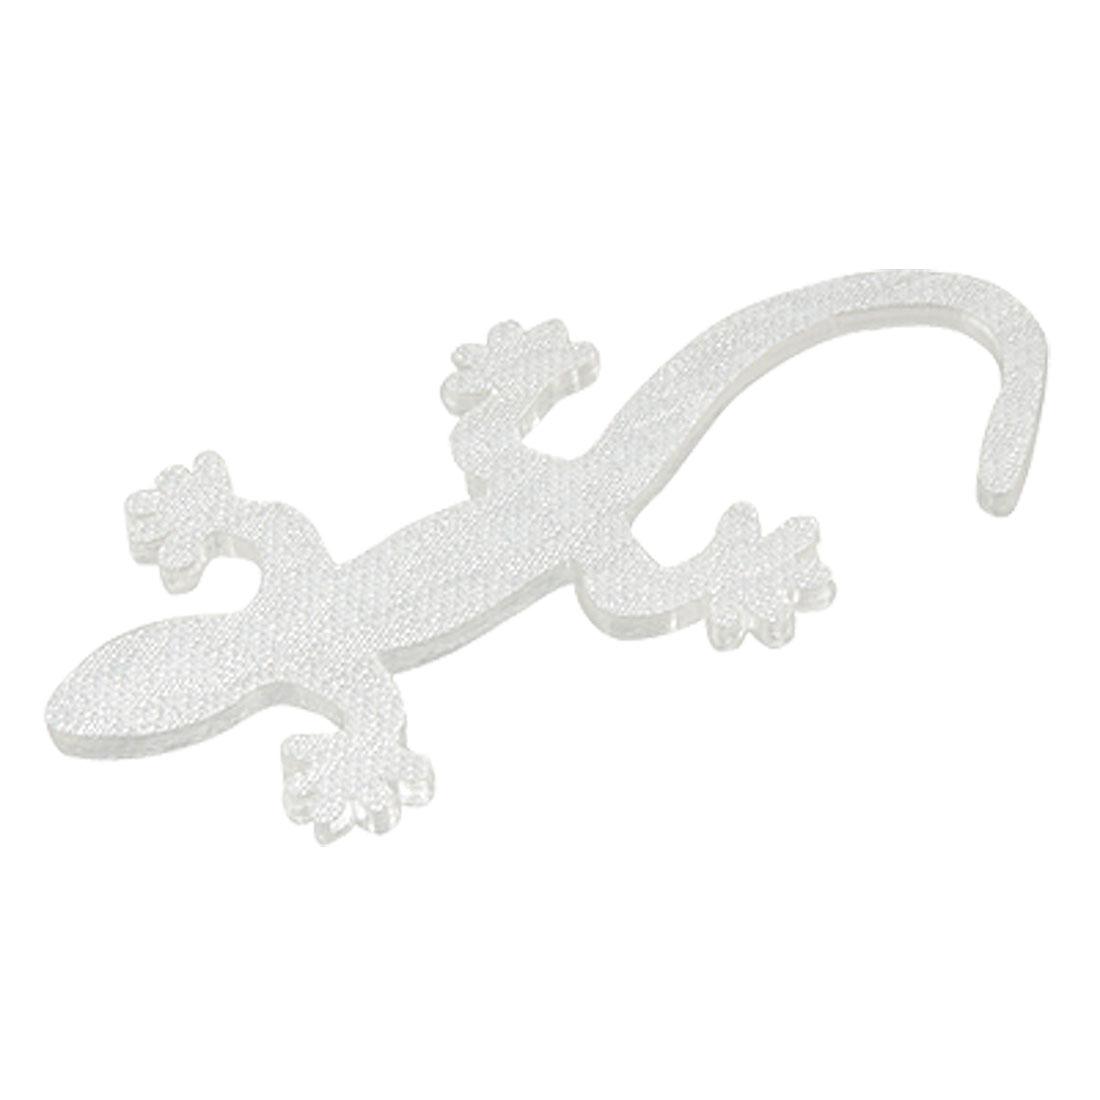 Car Gilltery Silver Tone Plastic Gecko Shape 3D Sticker